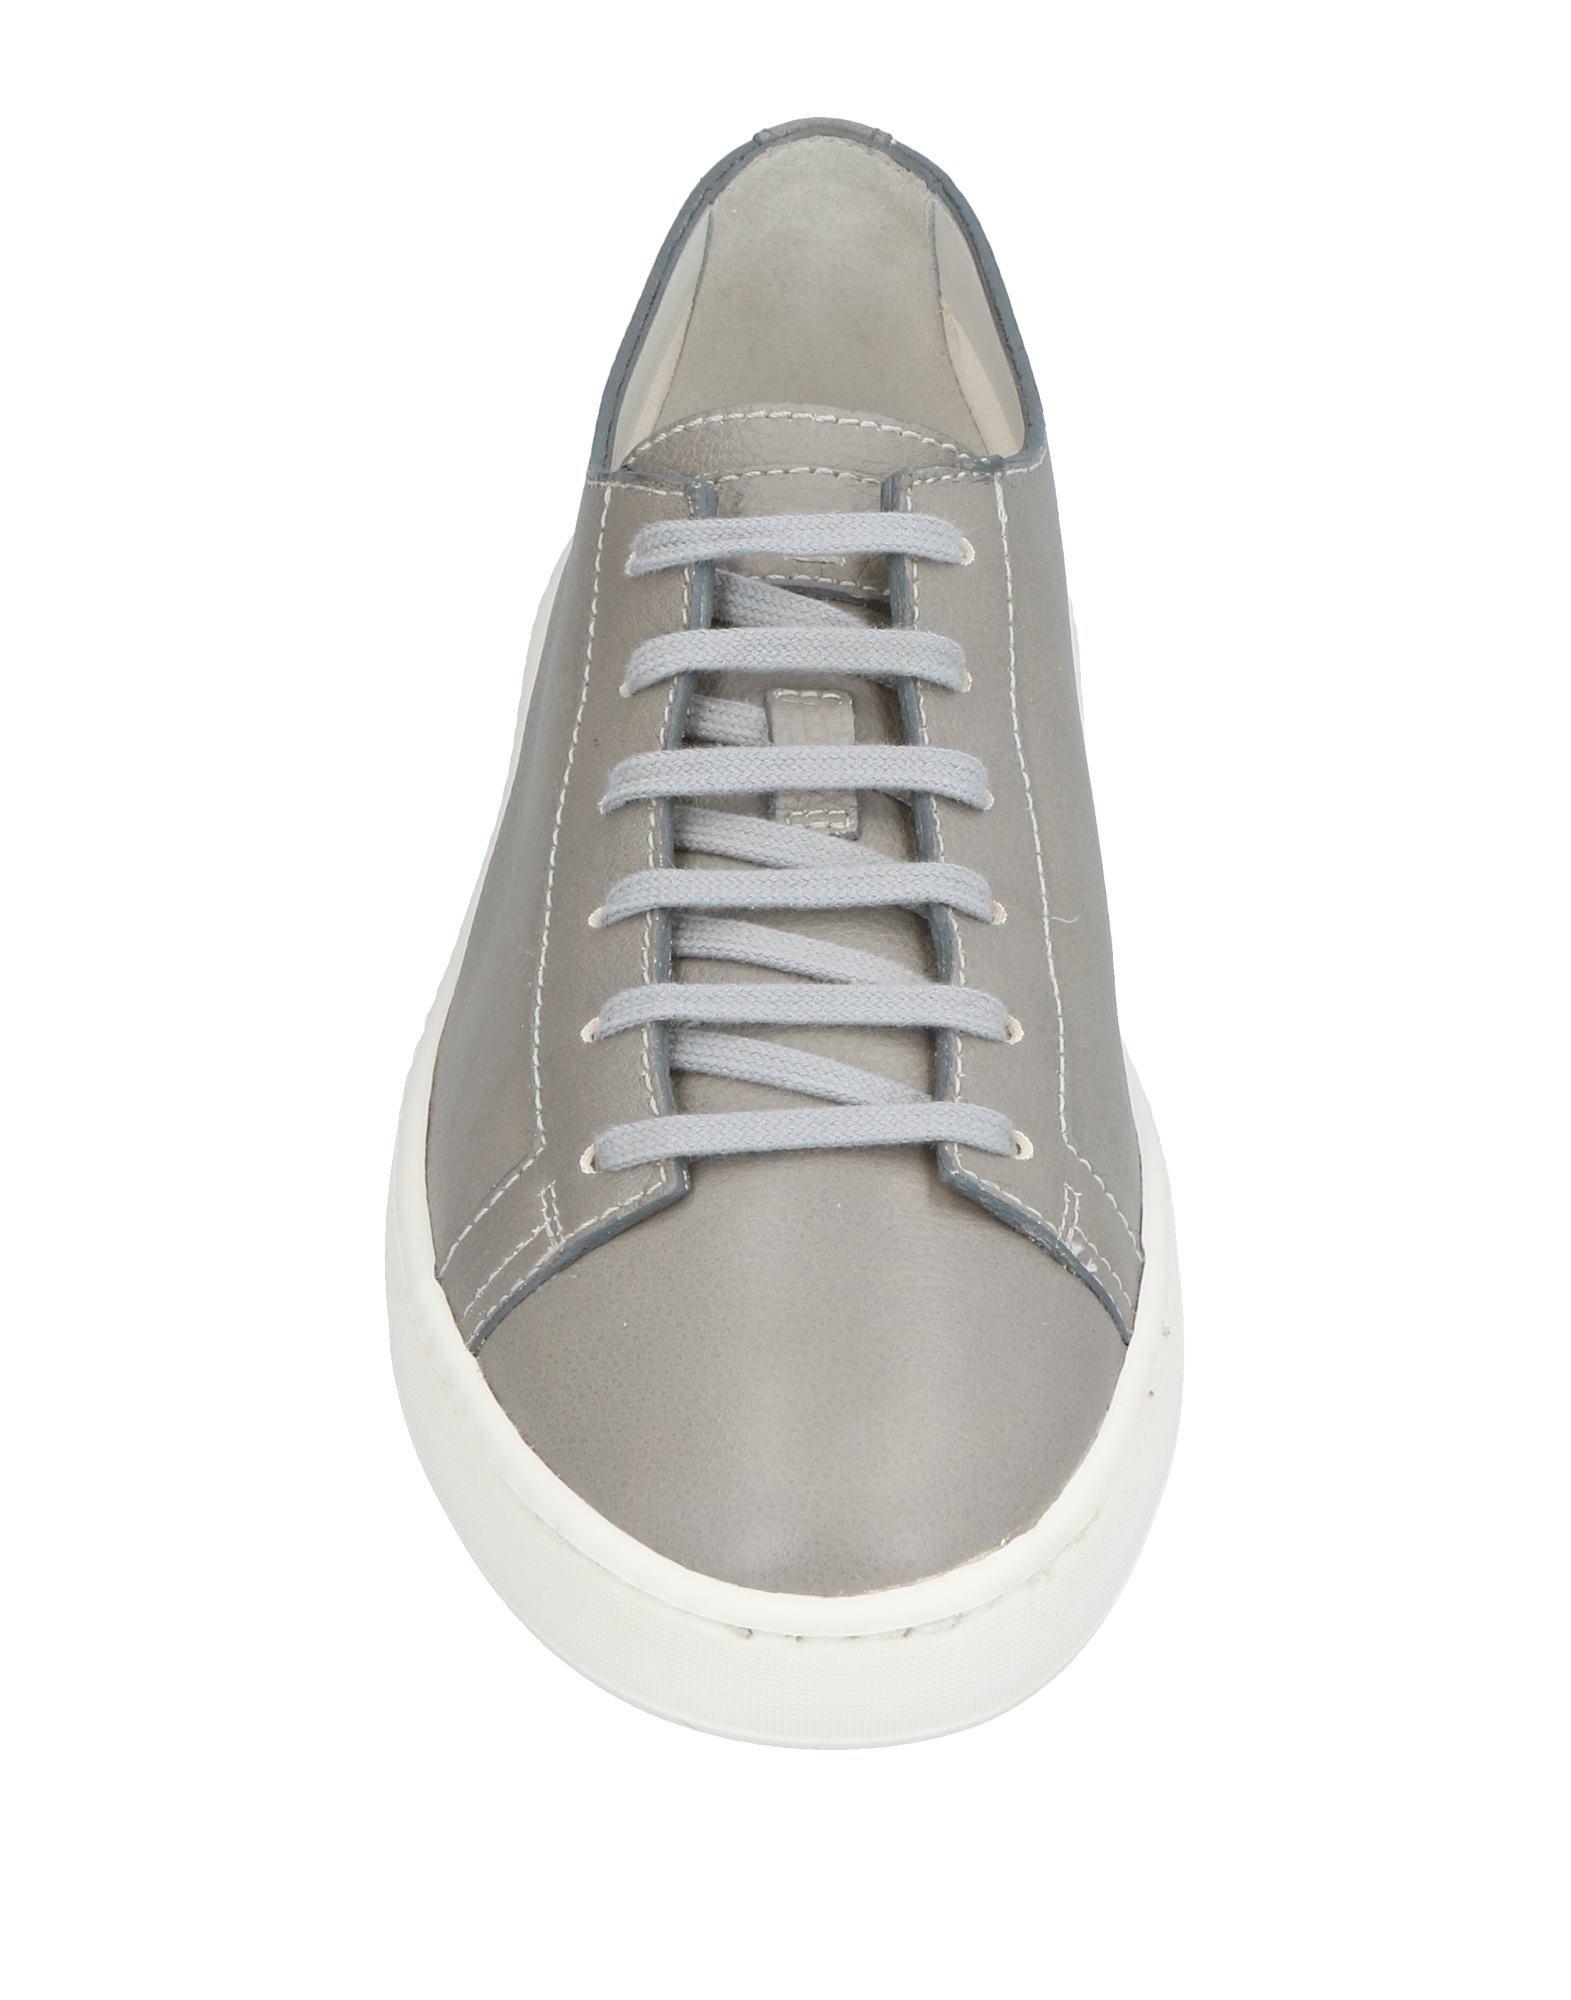 11409832NW Santoni Sneakers Herren  11409832NW  b43e3b